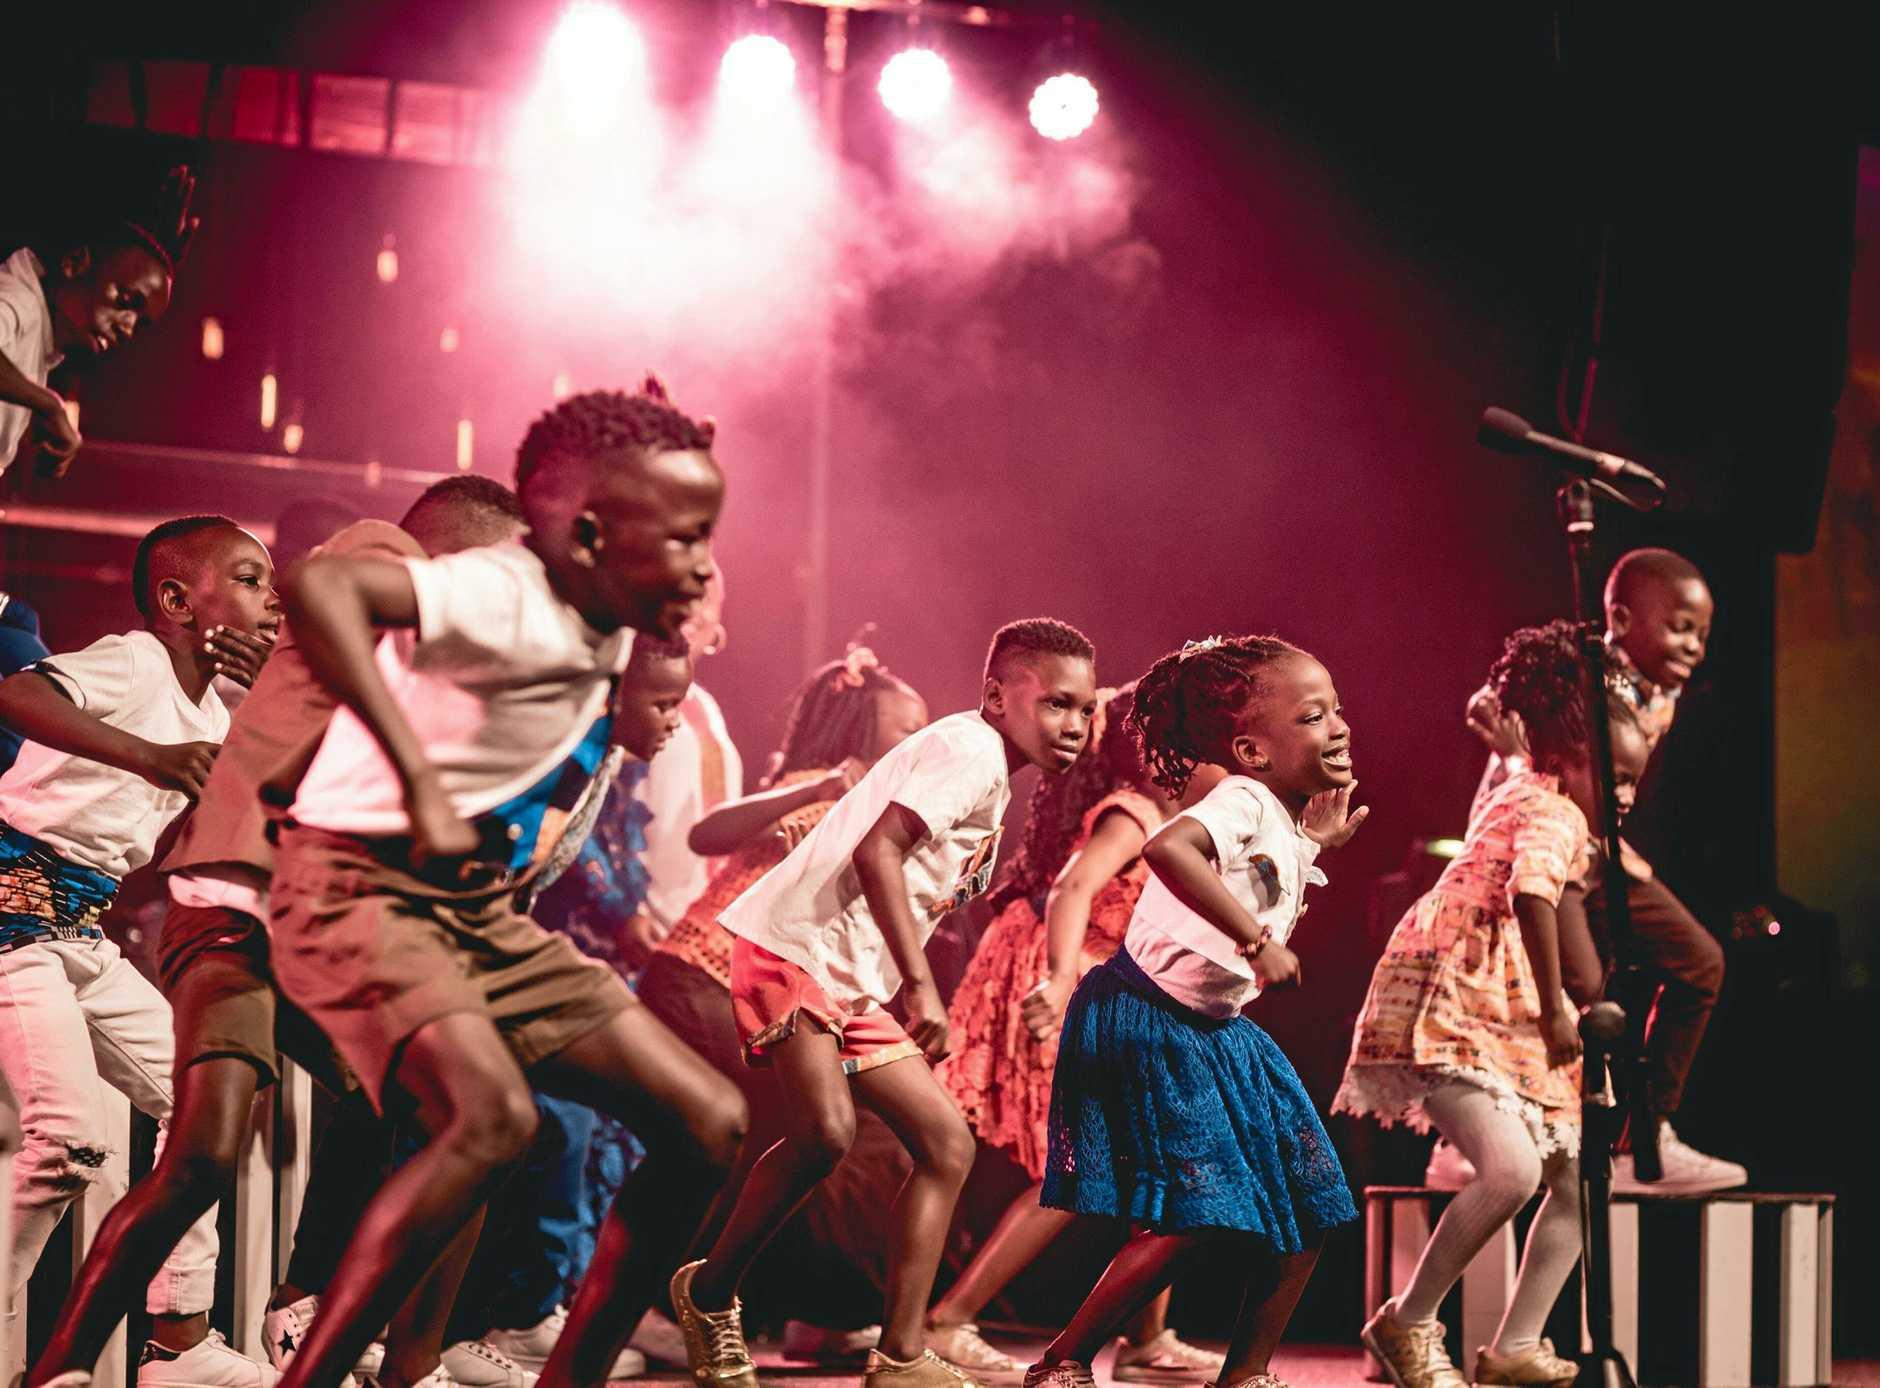 The Watoto Children's Choir enjoy travelling through regional Australia to perform to new audiences.